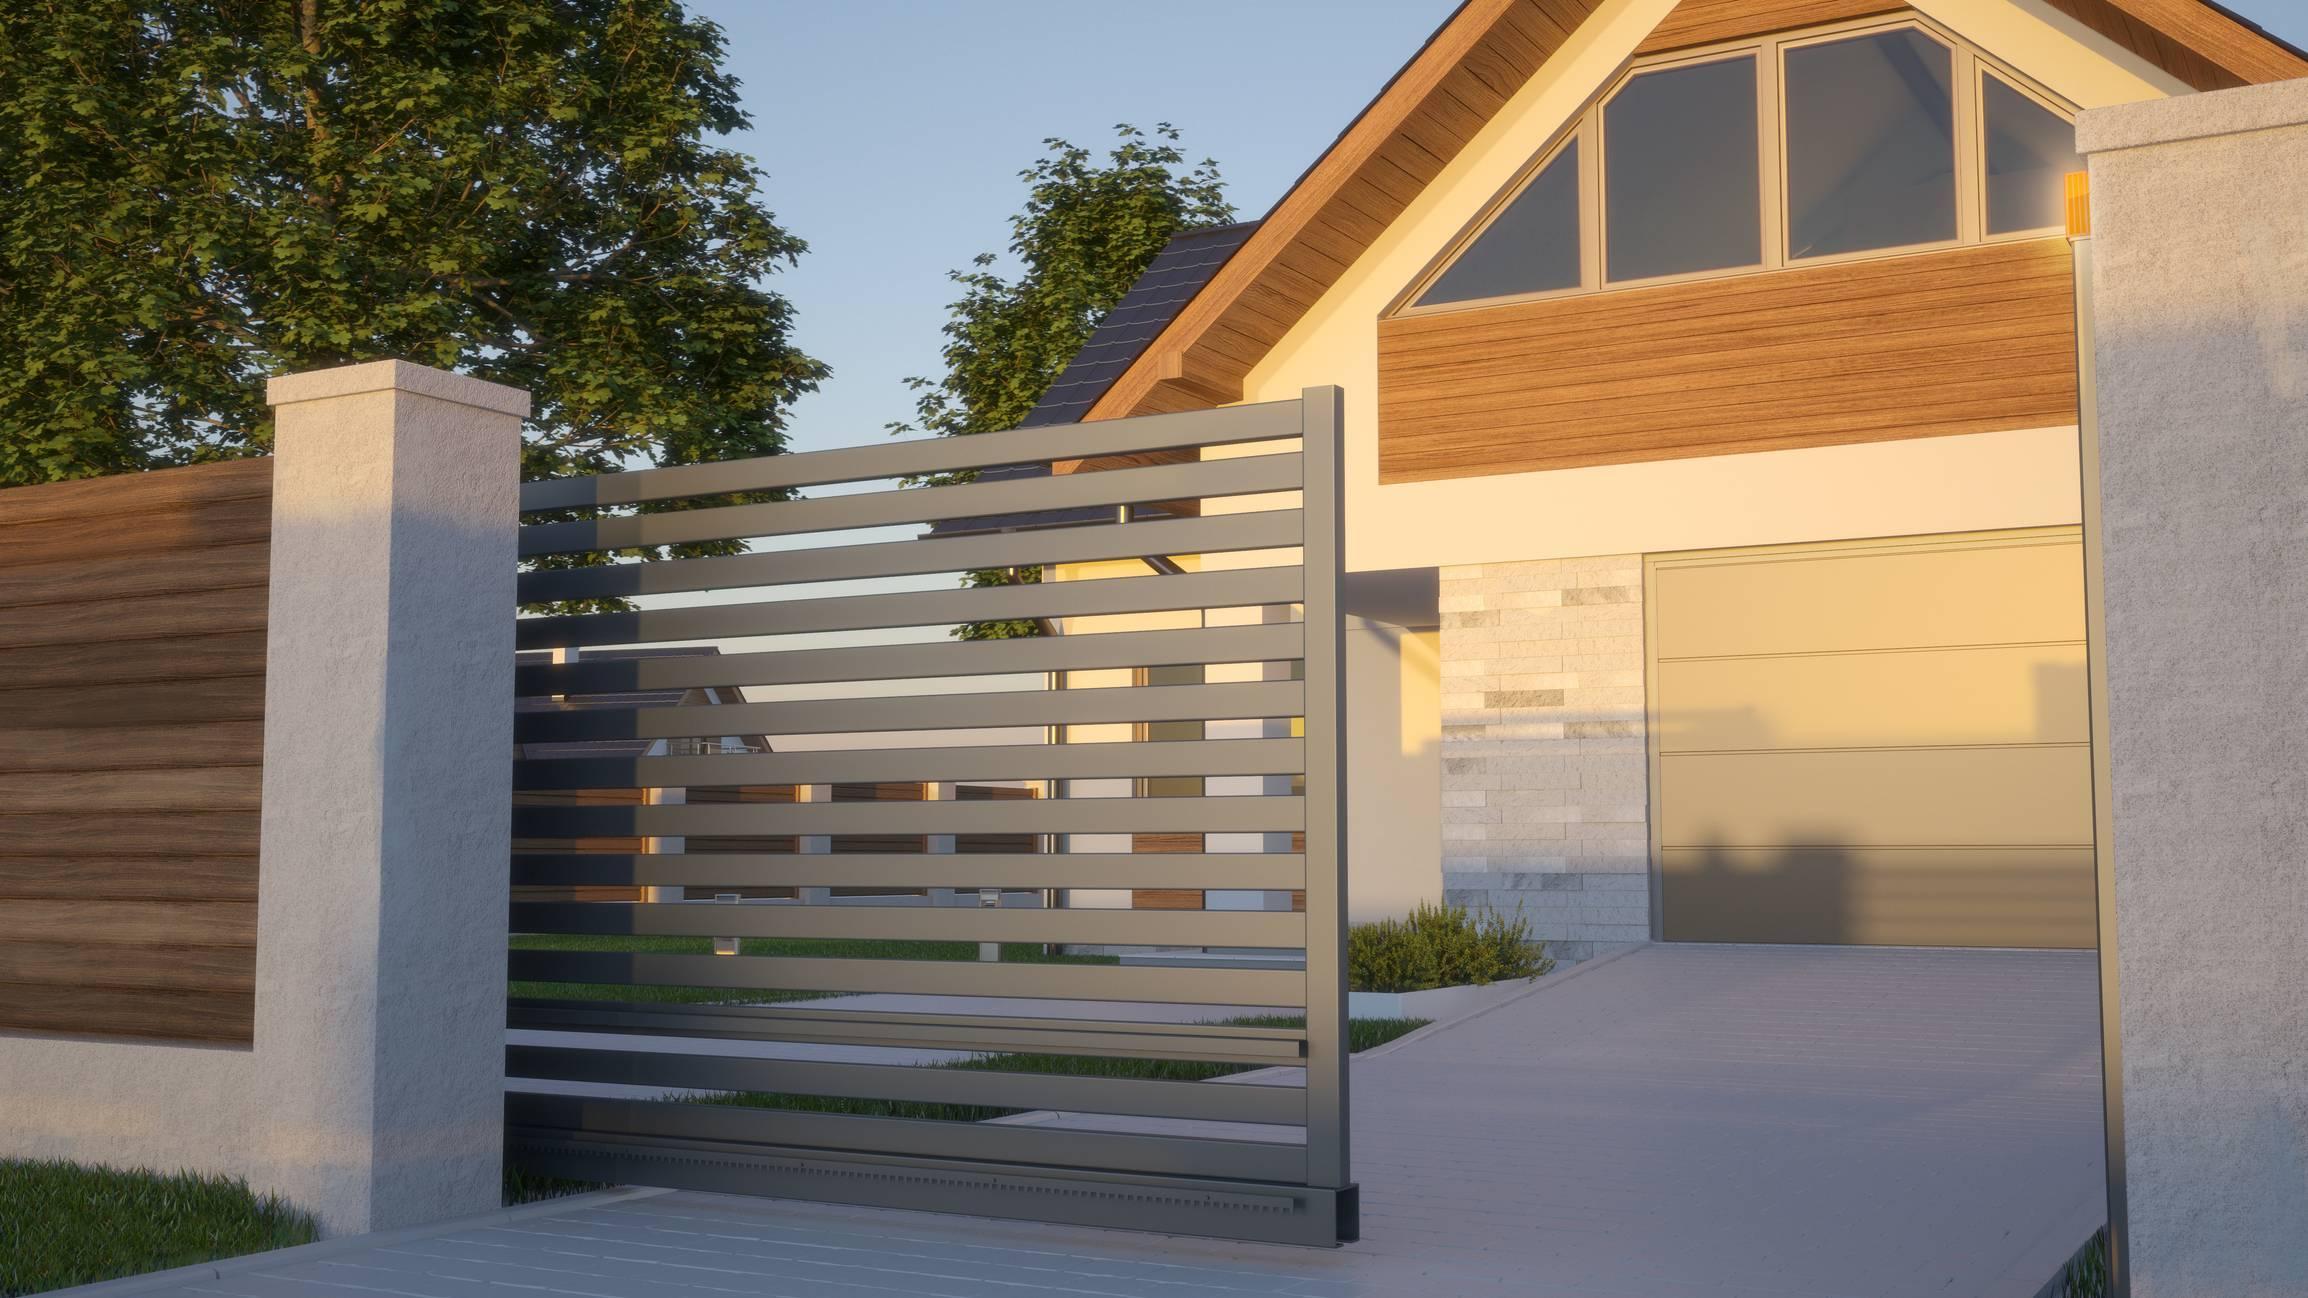 portail autoportant design maison futuriste